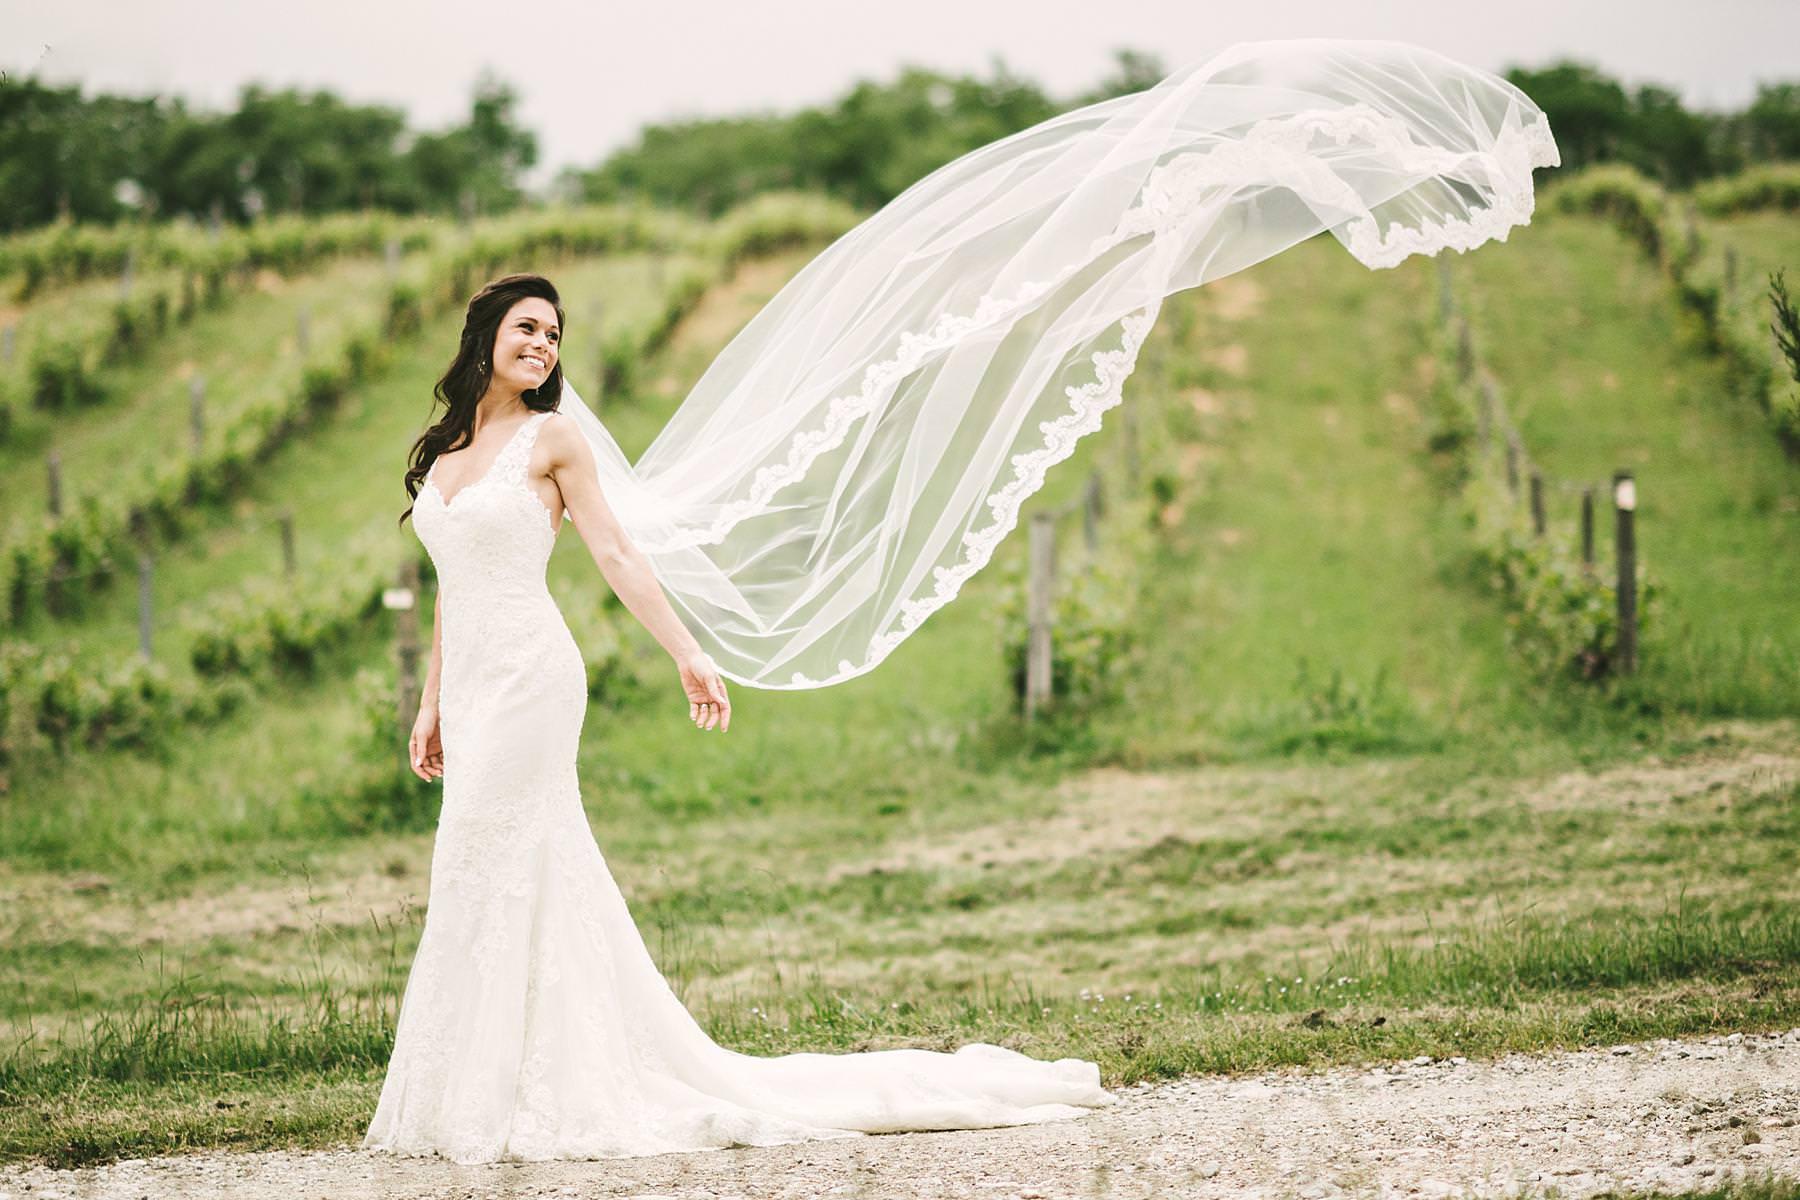 Another beautiful bride wedding photo in Pronovias gown at Villa La Selva